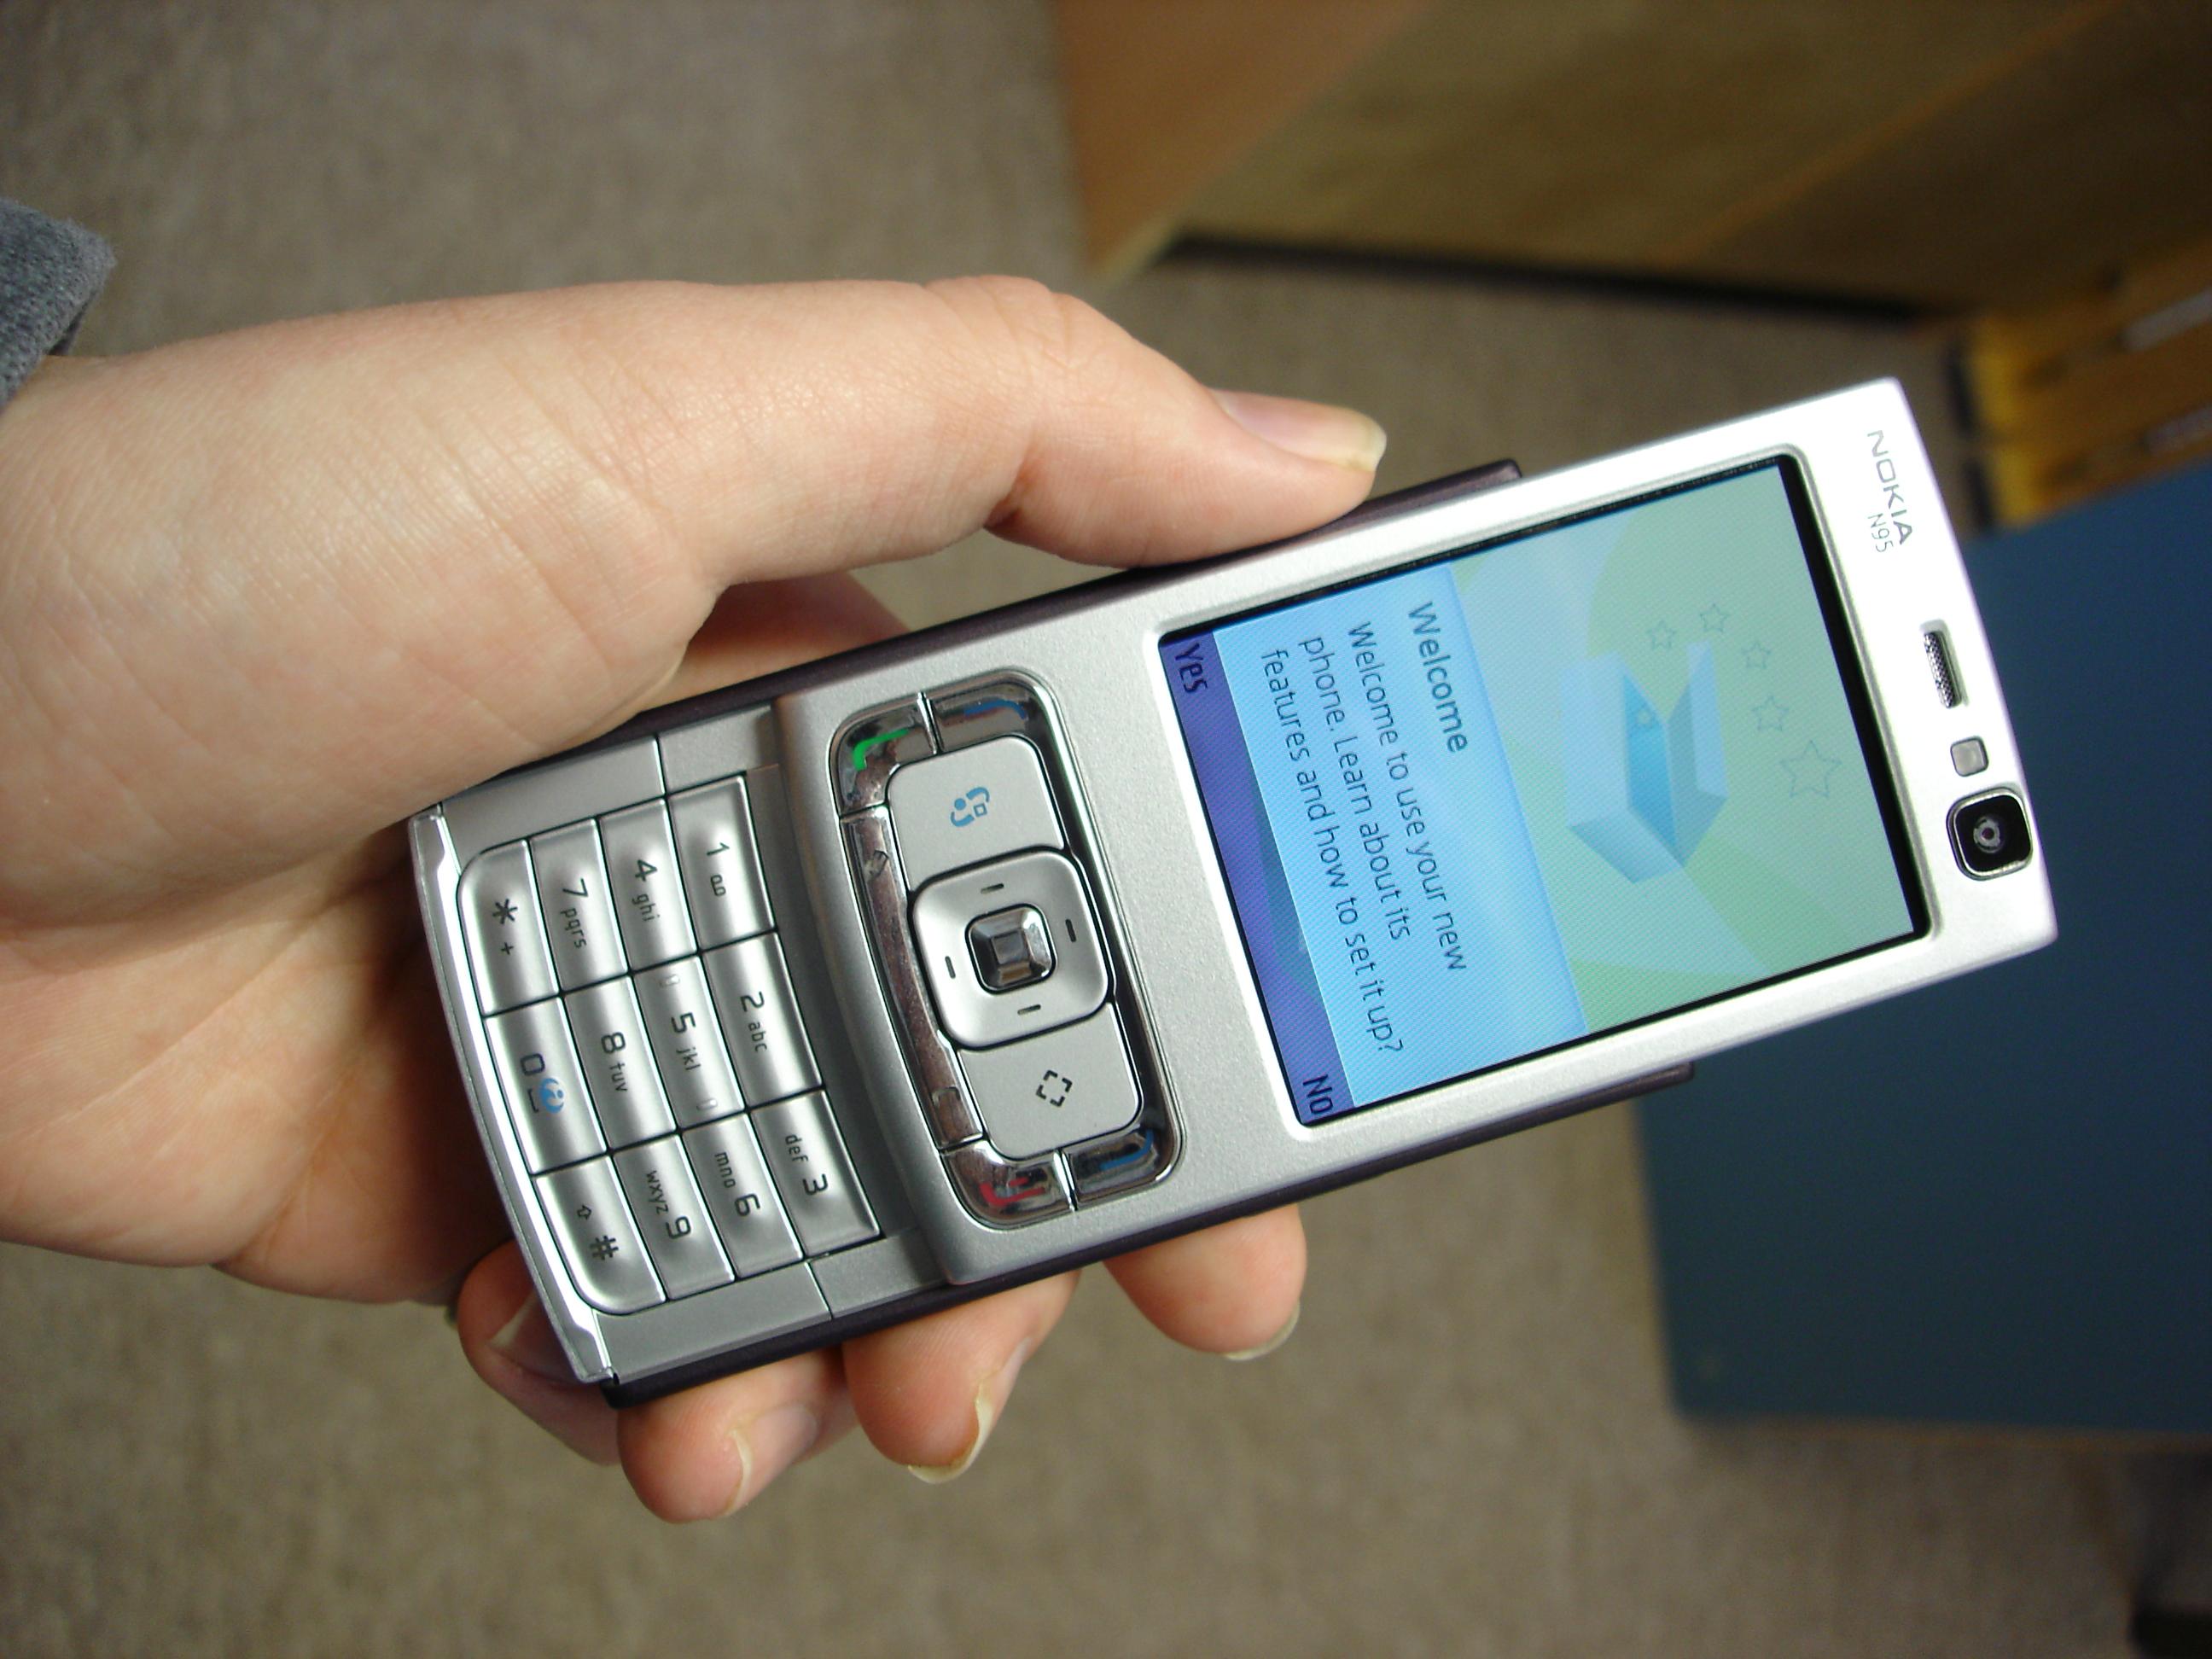 Nokia N95 Impressions Nokia First N95 First